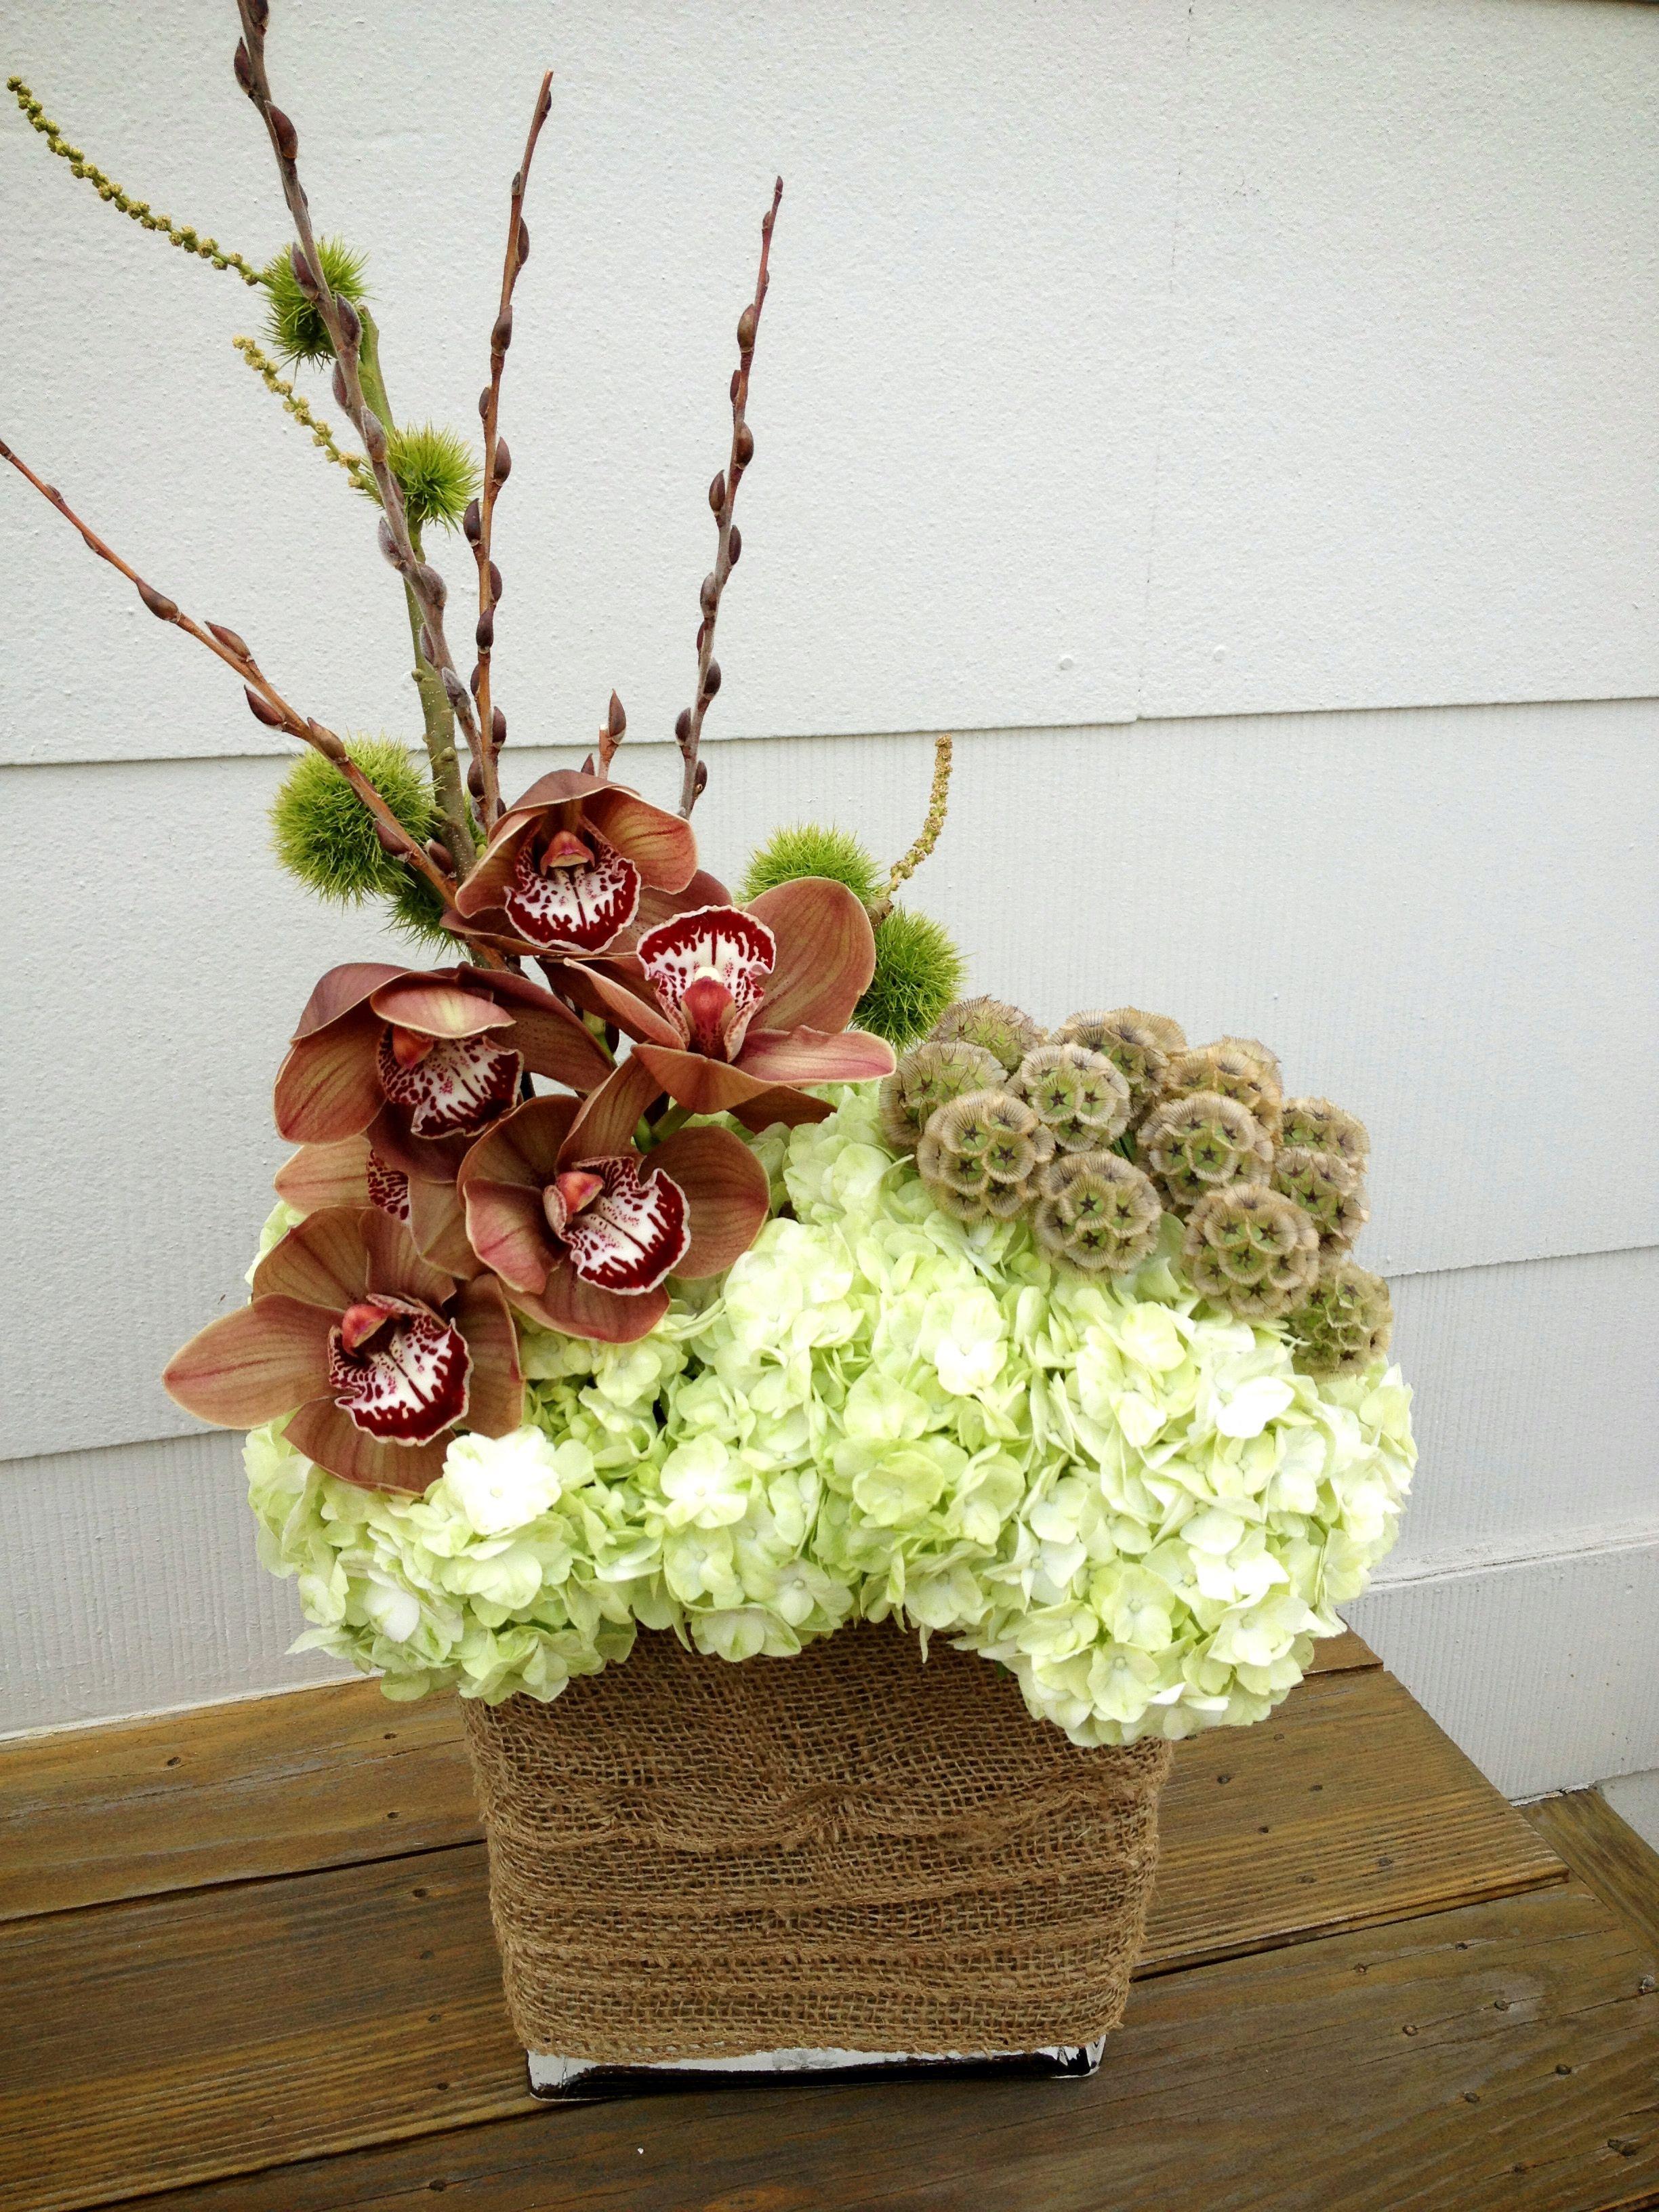 Cymbidium Orchid, Chestnut, Hydrangea, Scabiosa Pod Arrangementfrom Httpdoingsocom